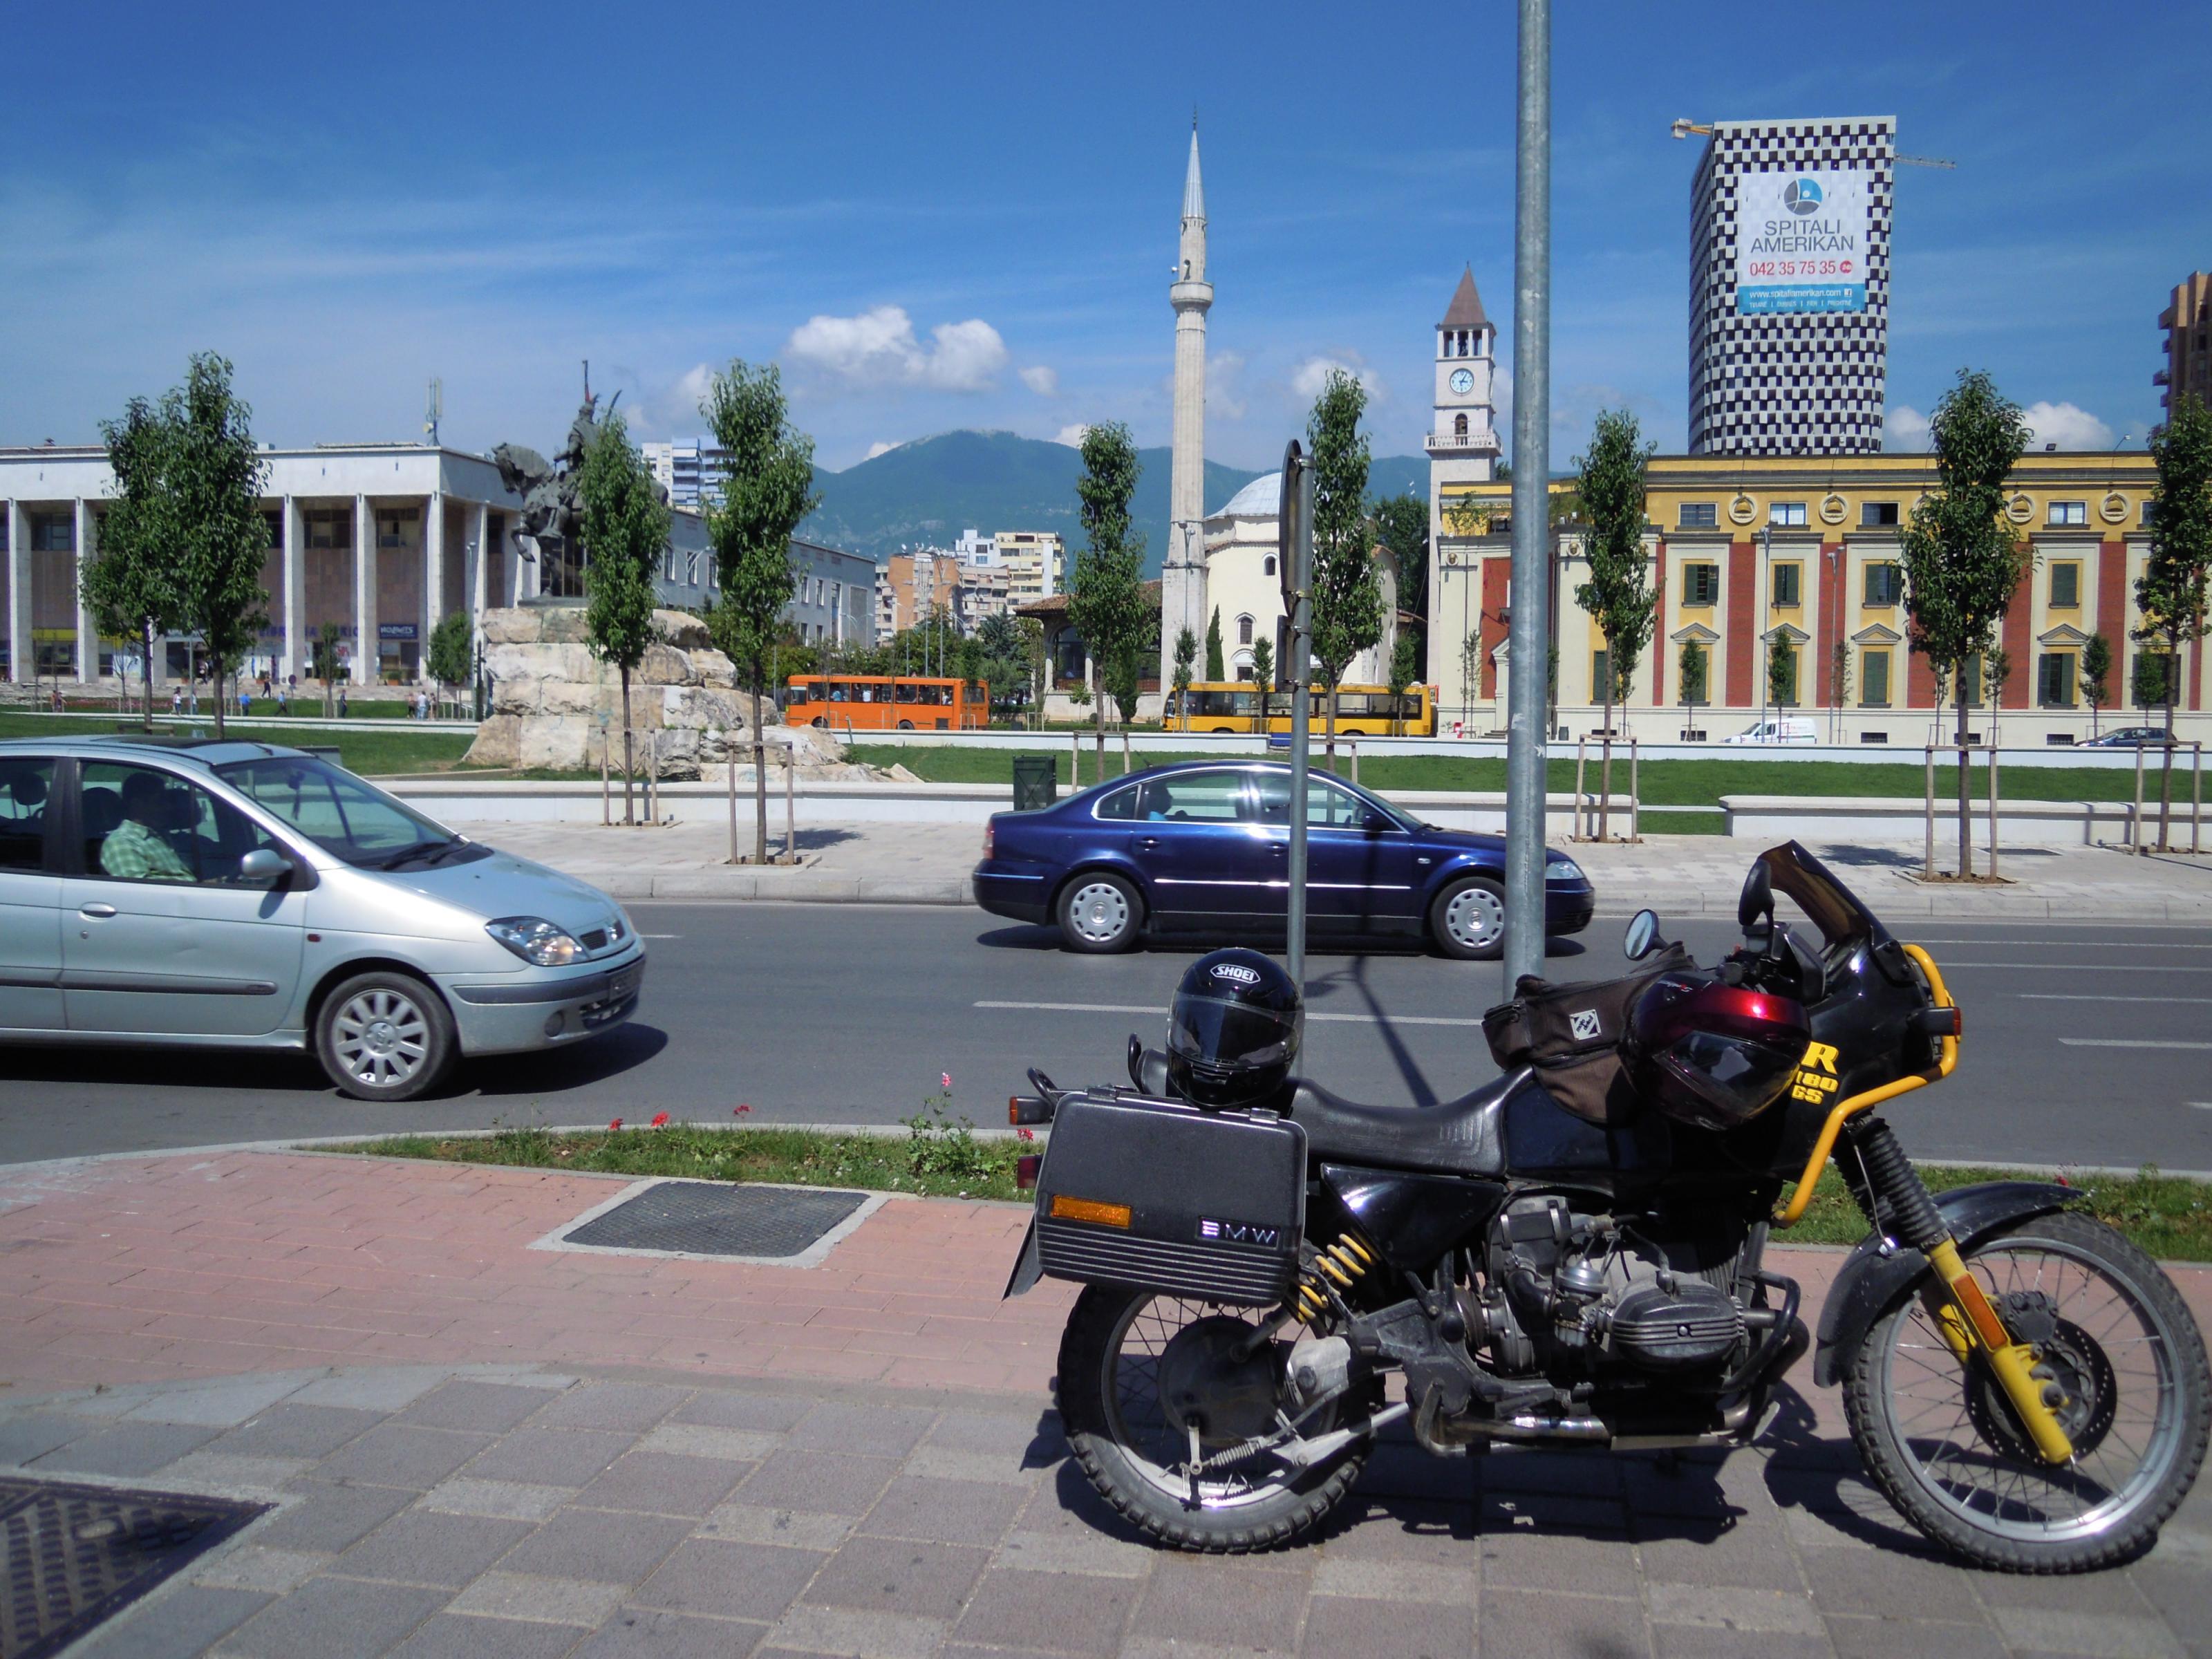 montenegro-2012-082.jpg